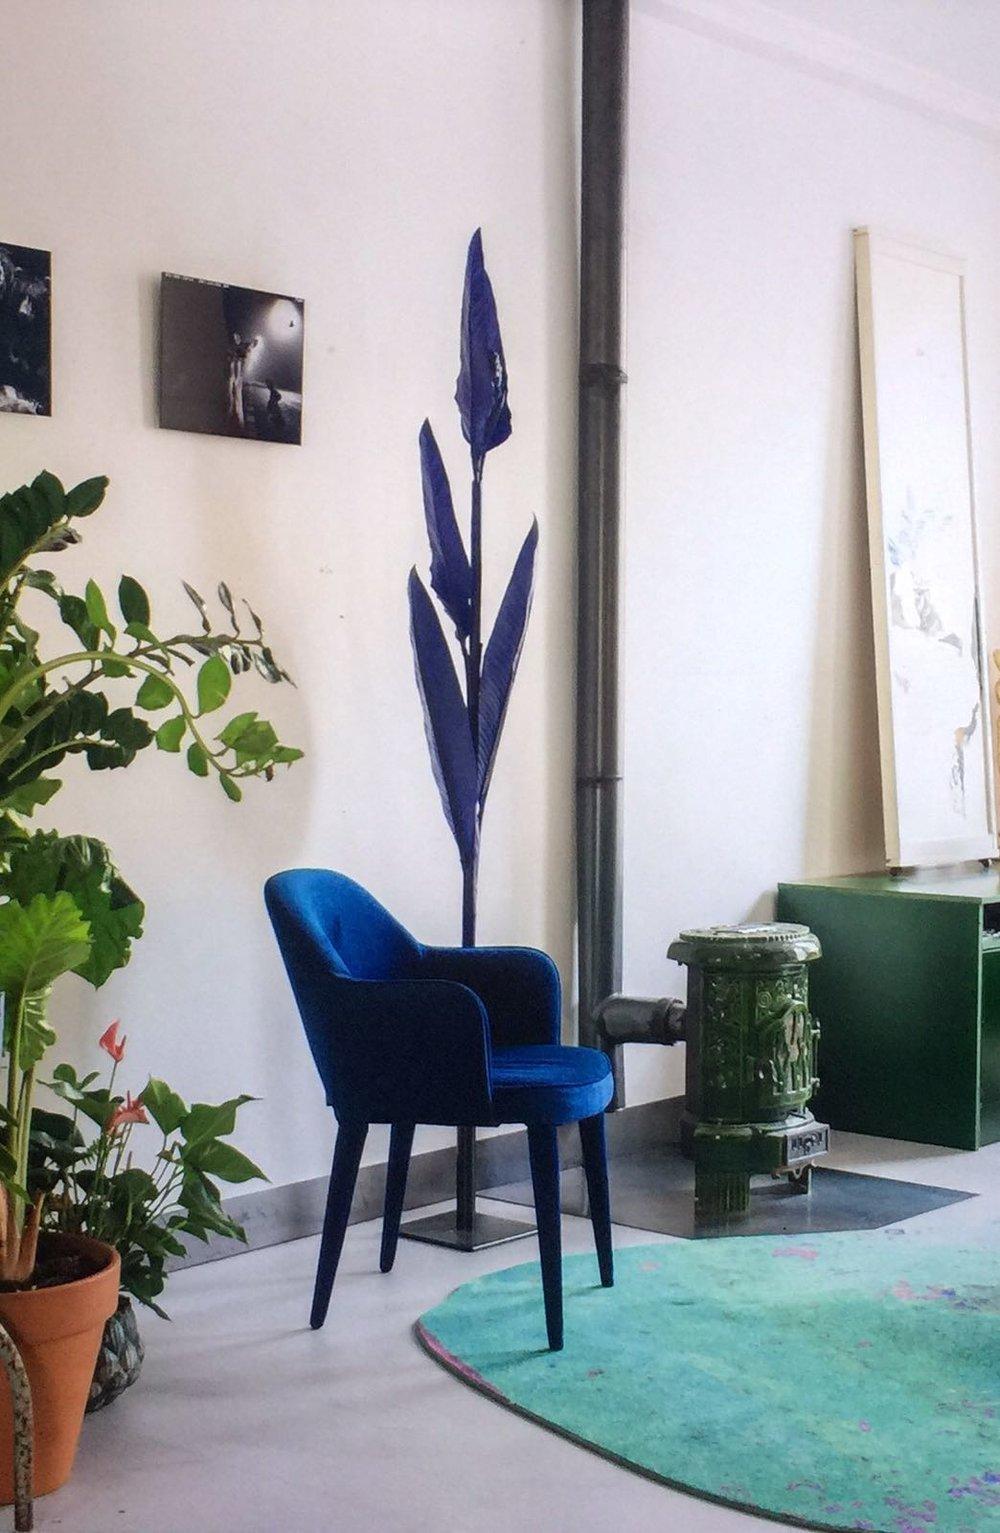 StudioNoun-InteriorDesignProject-PrivateHome-Amsterdam21.jpeg